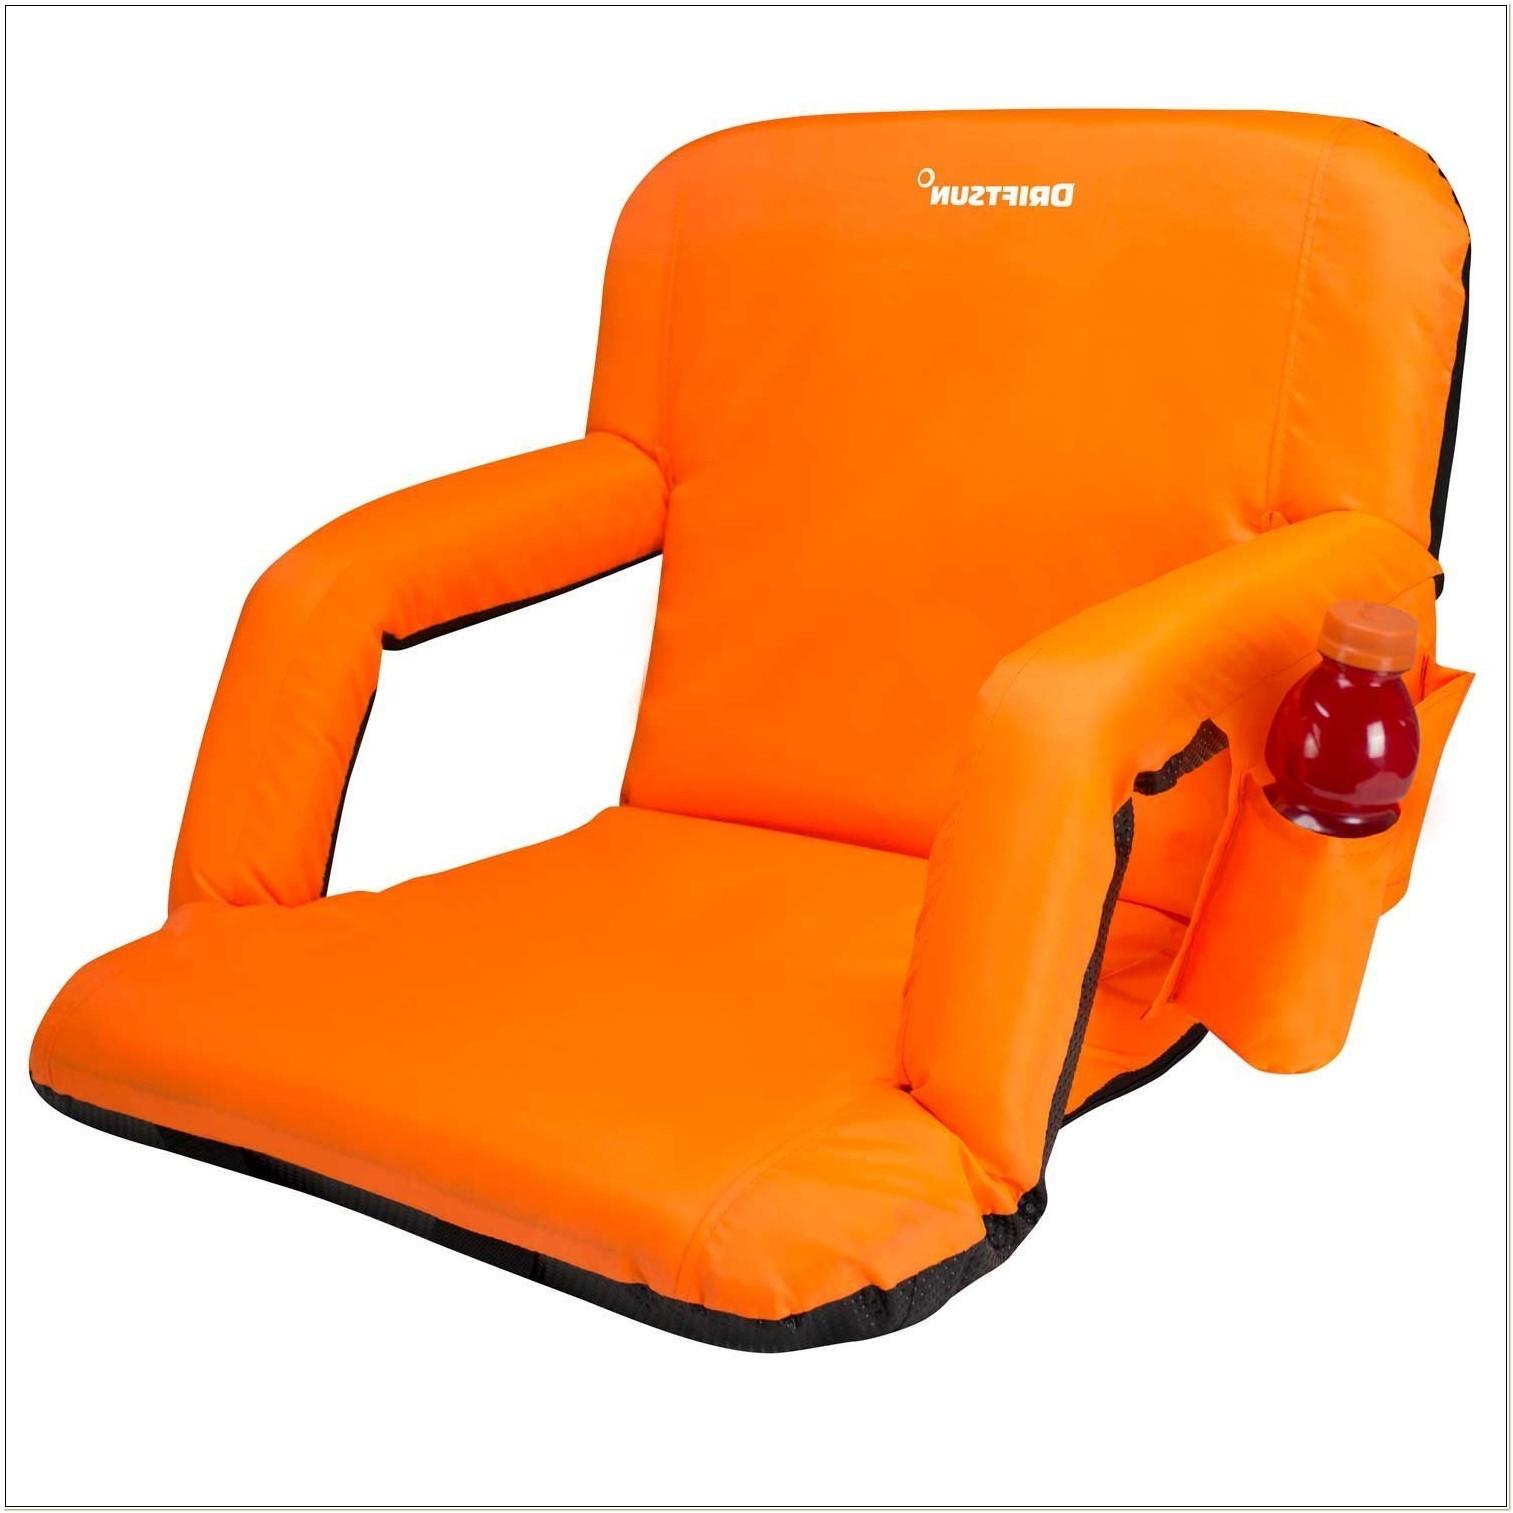 Folding Chairs For Bleachers